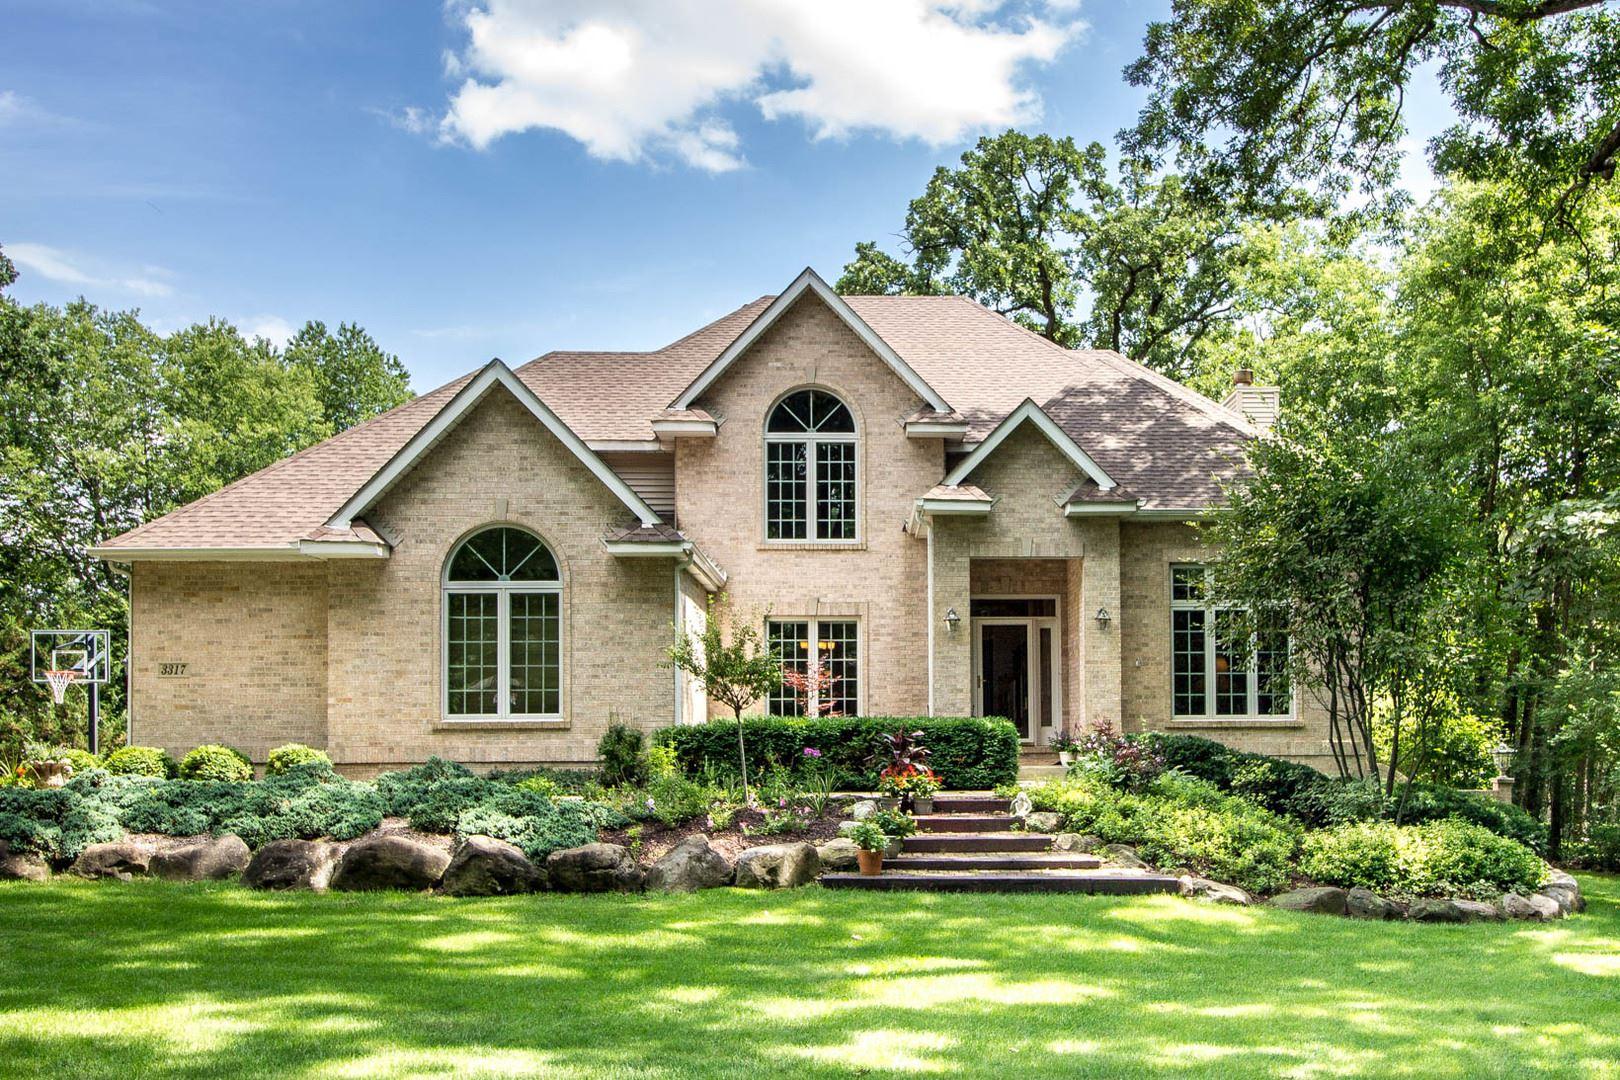 3317 Cardinal Lane, Spring Grove, IL 60081 - #: 10808405